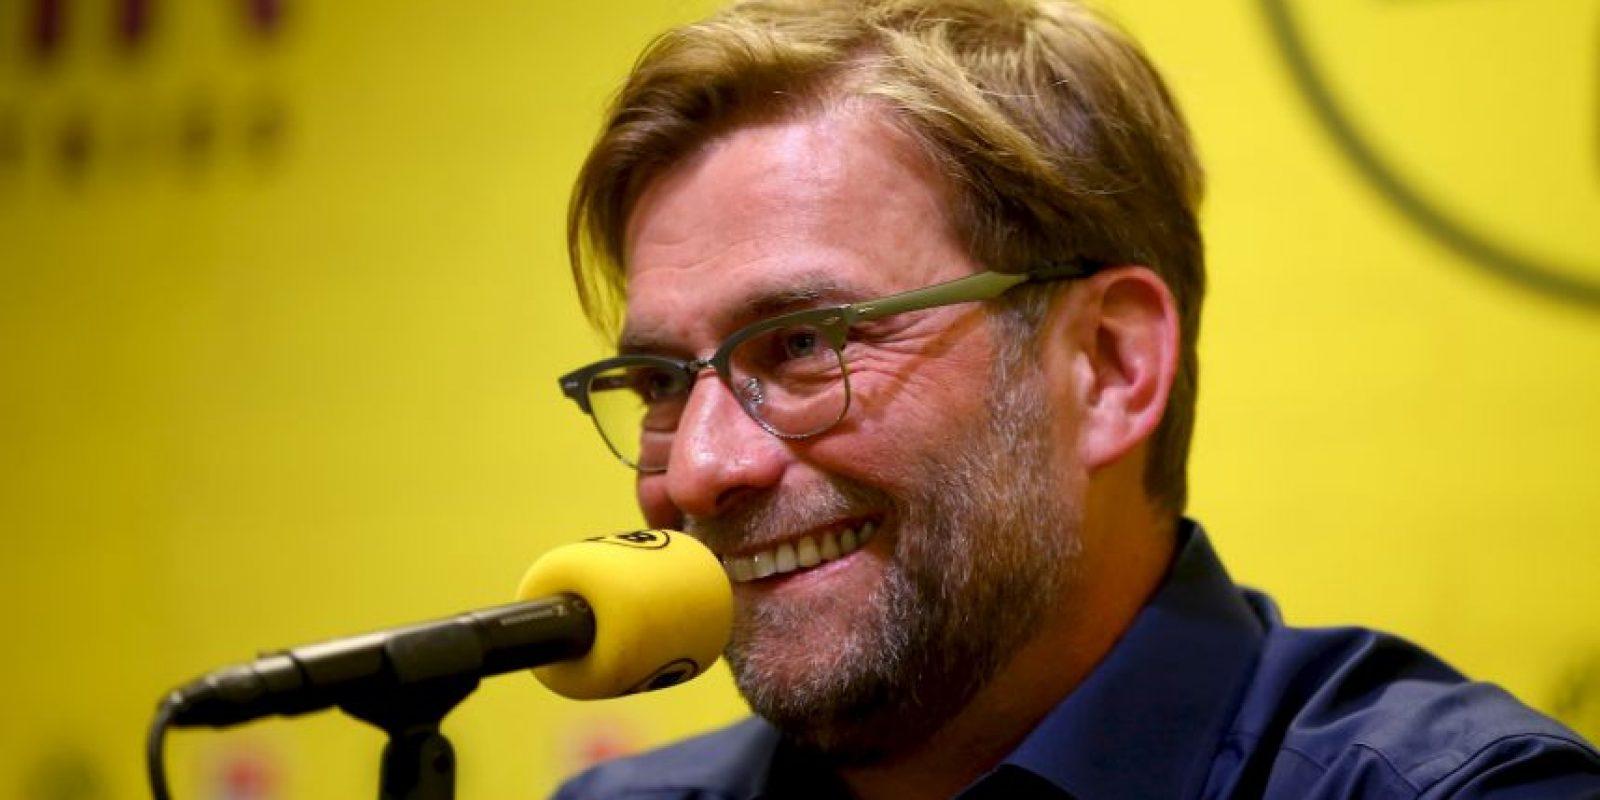 En 2013, Borussia Dortmund logró meterse a la final de la Champions League, aunque perdió frente al Bayern Munich. Foto:Getty Images